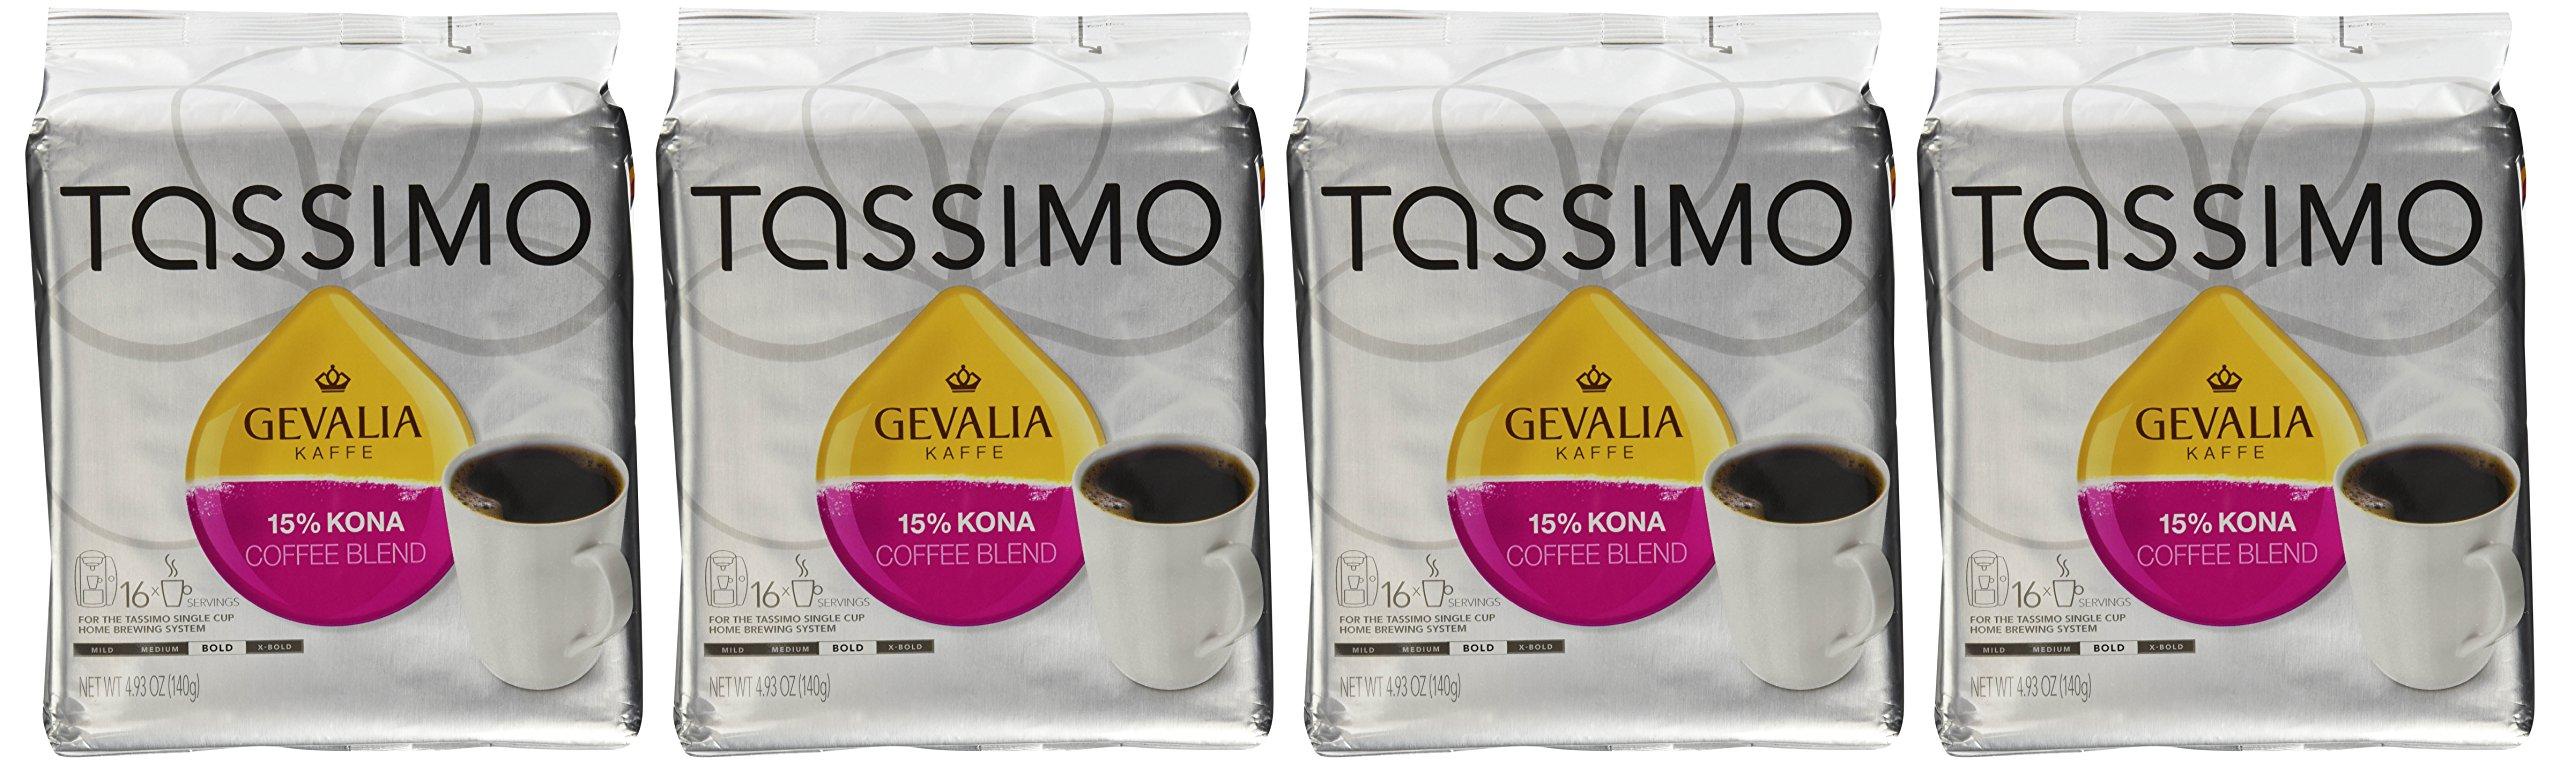 Gevalia Kaffe 15% Kona Blend Coffee (Pack of 4) by Gevalia